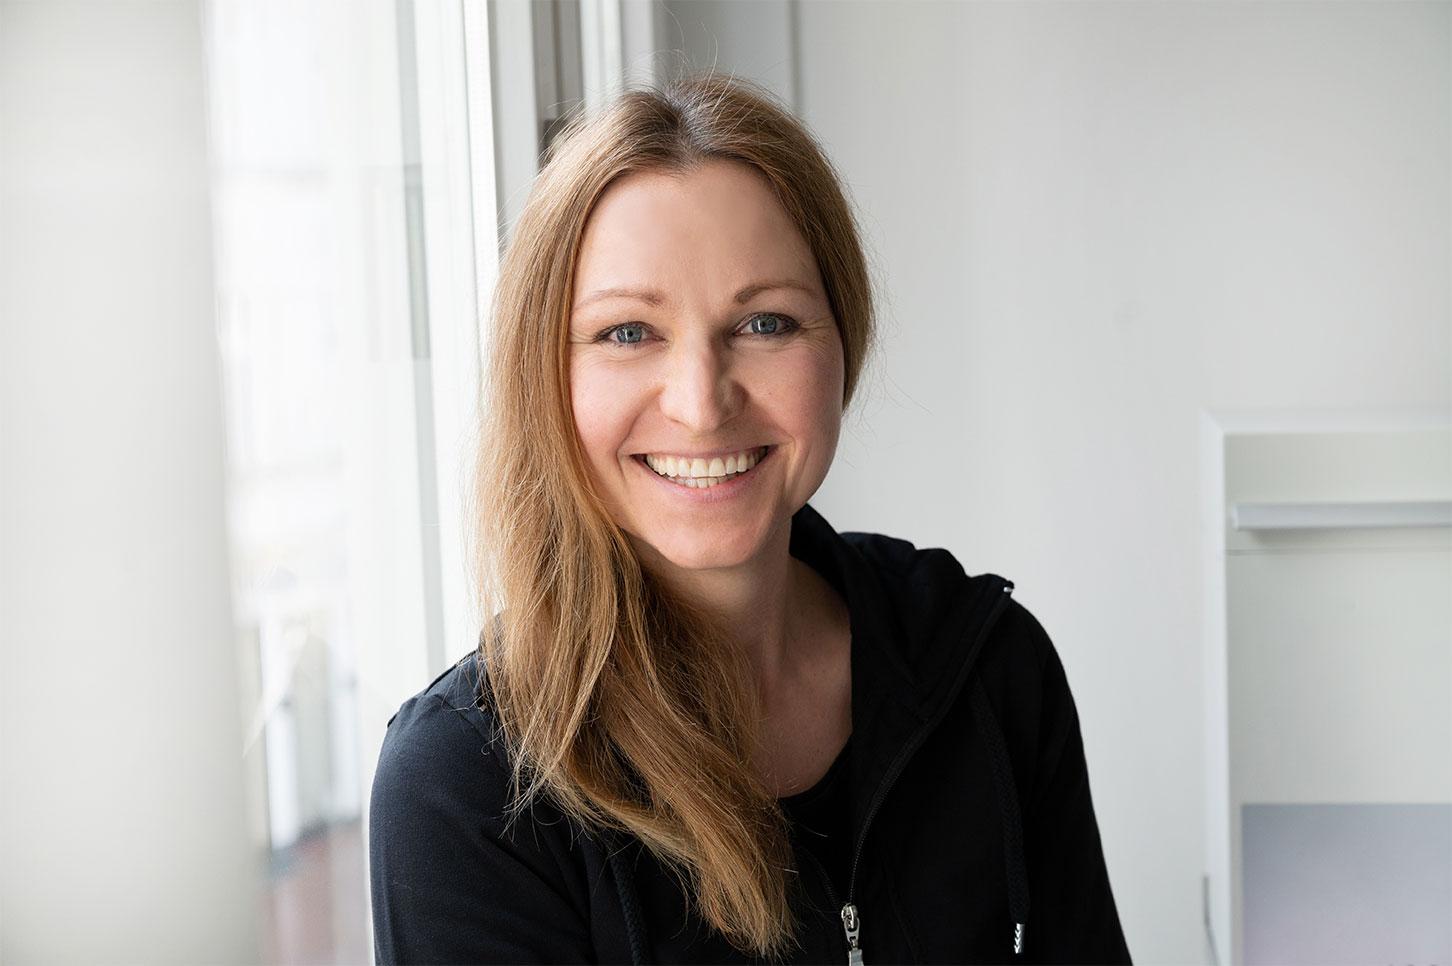 Biljana Brauner : Zahnarzthelferin